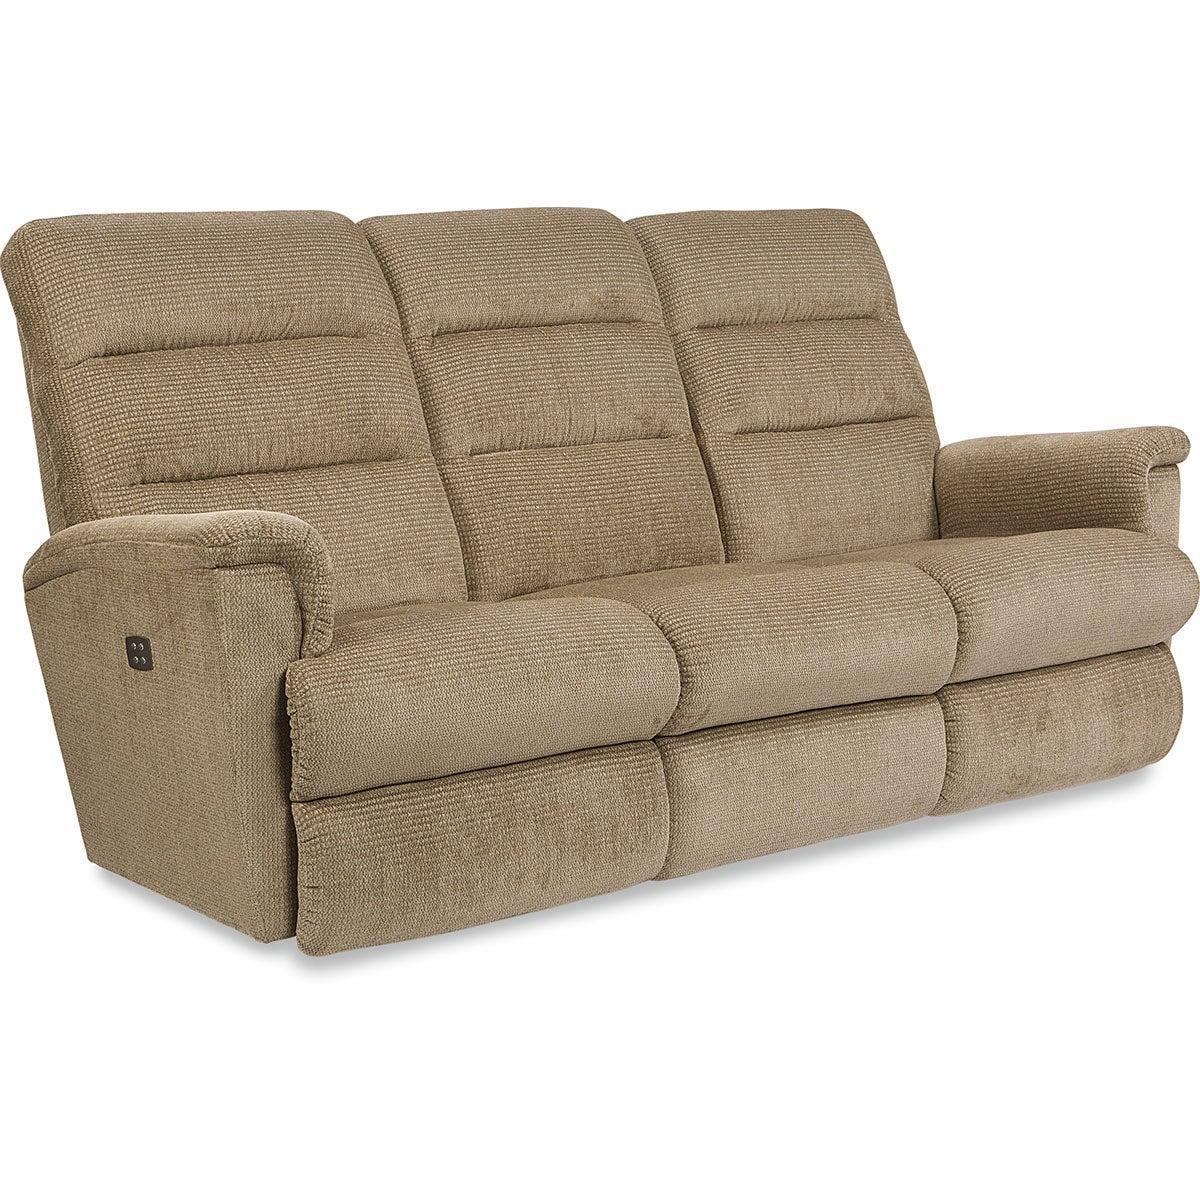 Tripoli PowerReclineXRw™ Full Reclining Sofa